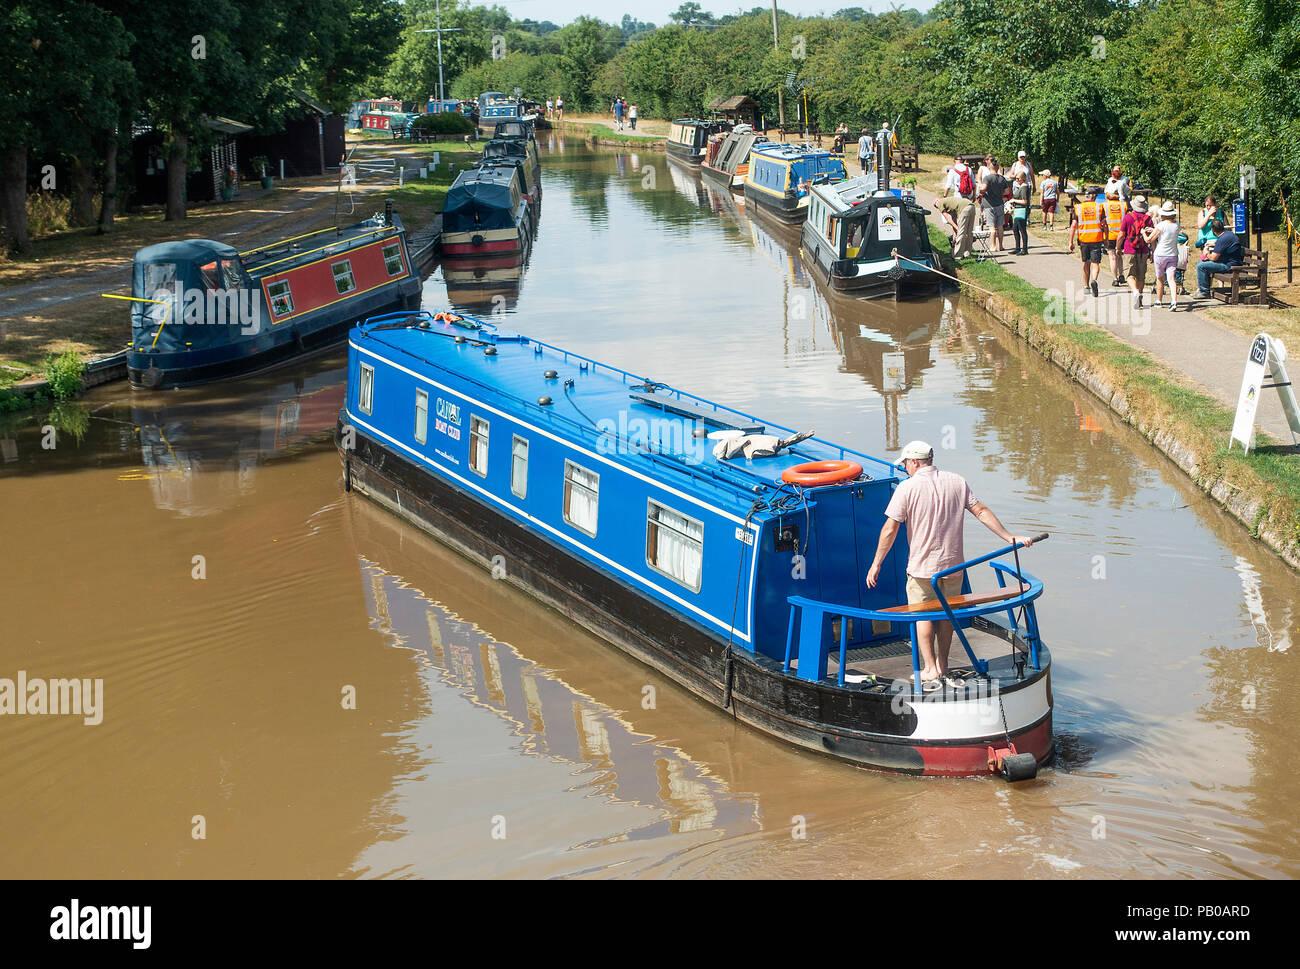 A Narrow Boat Navigating the Shropshire Union Canal near Nantwich Marina in Cheshire England United Kingdom UK Stock Photo